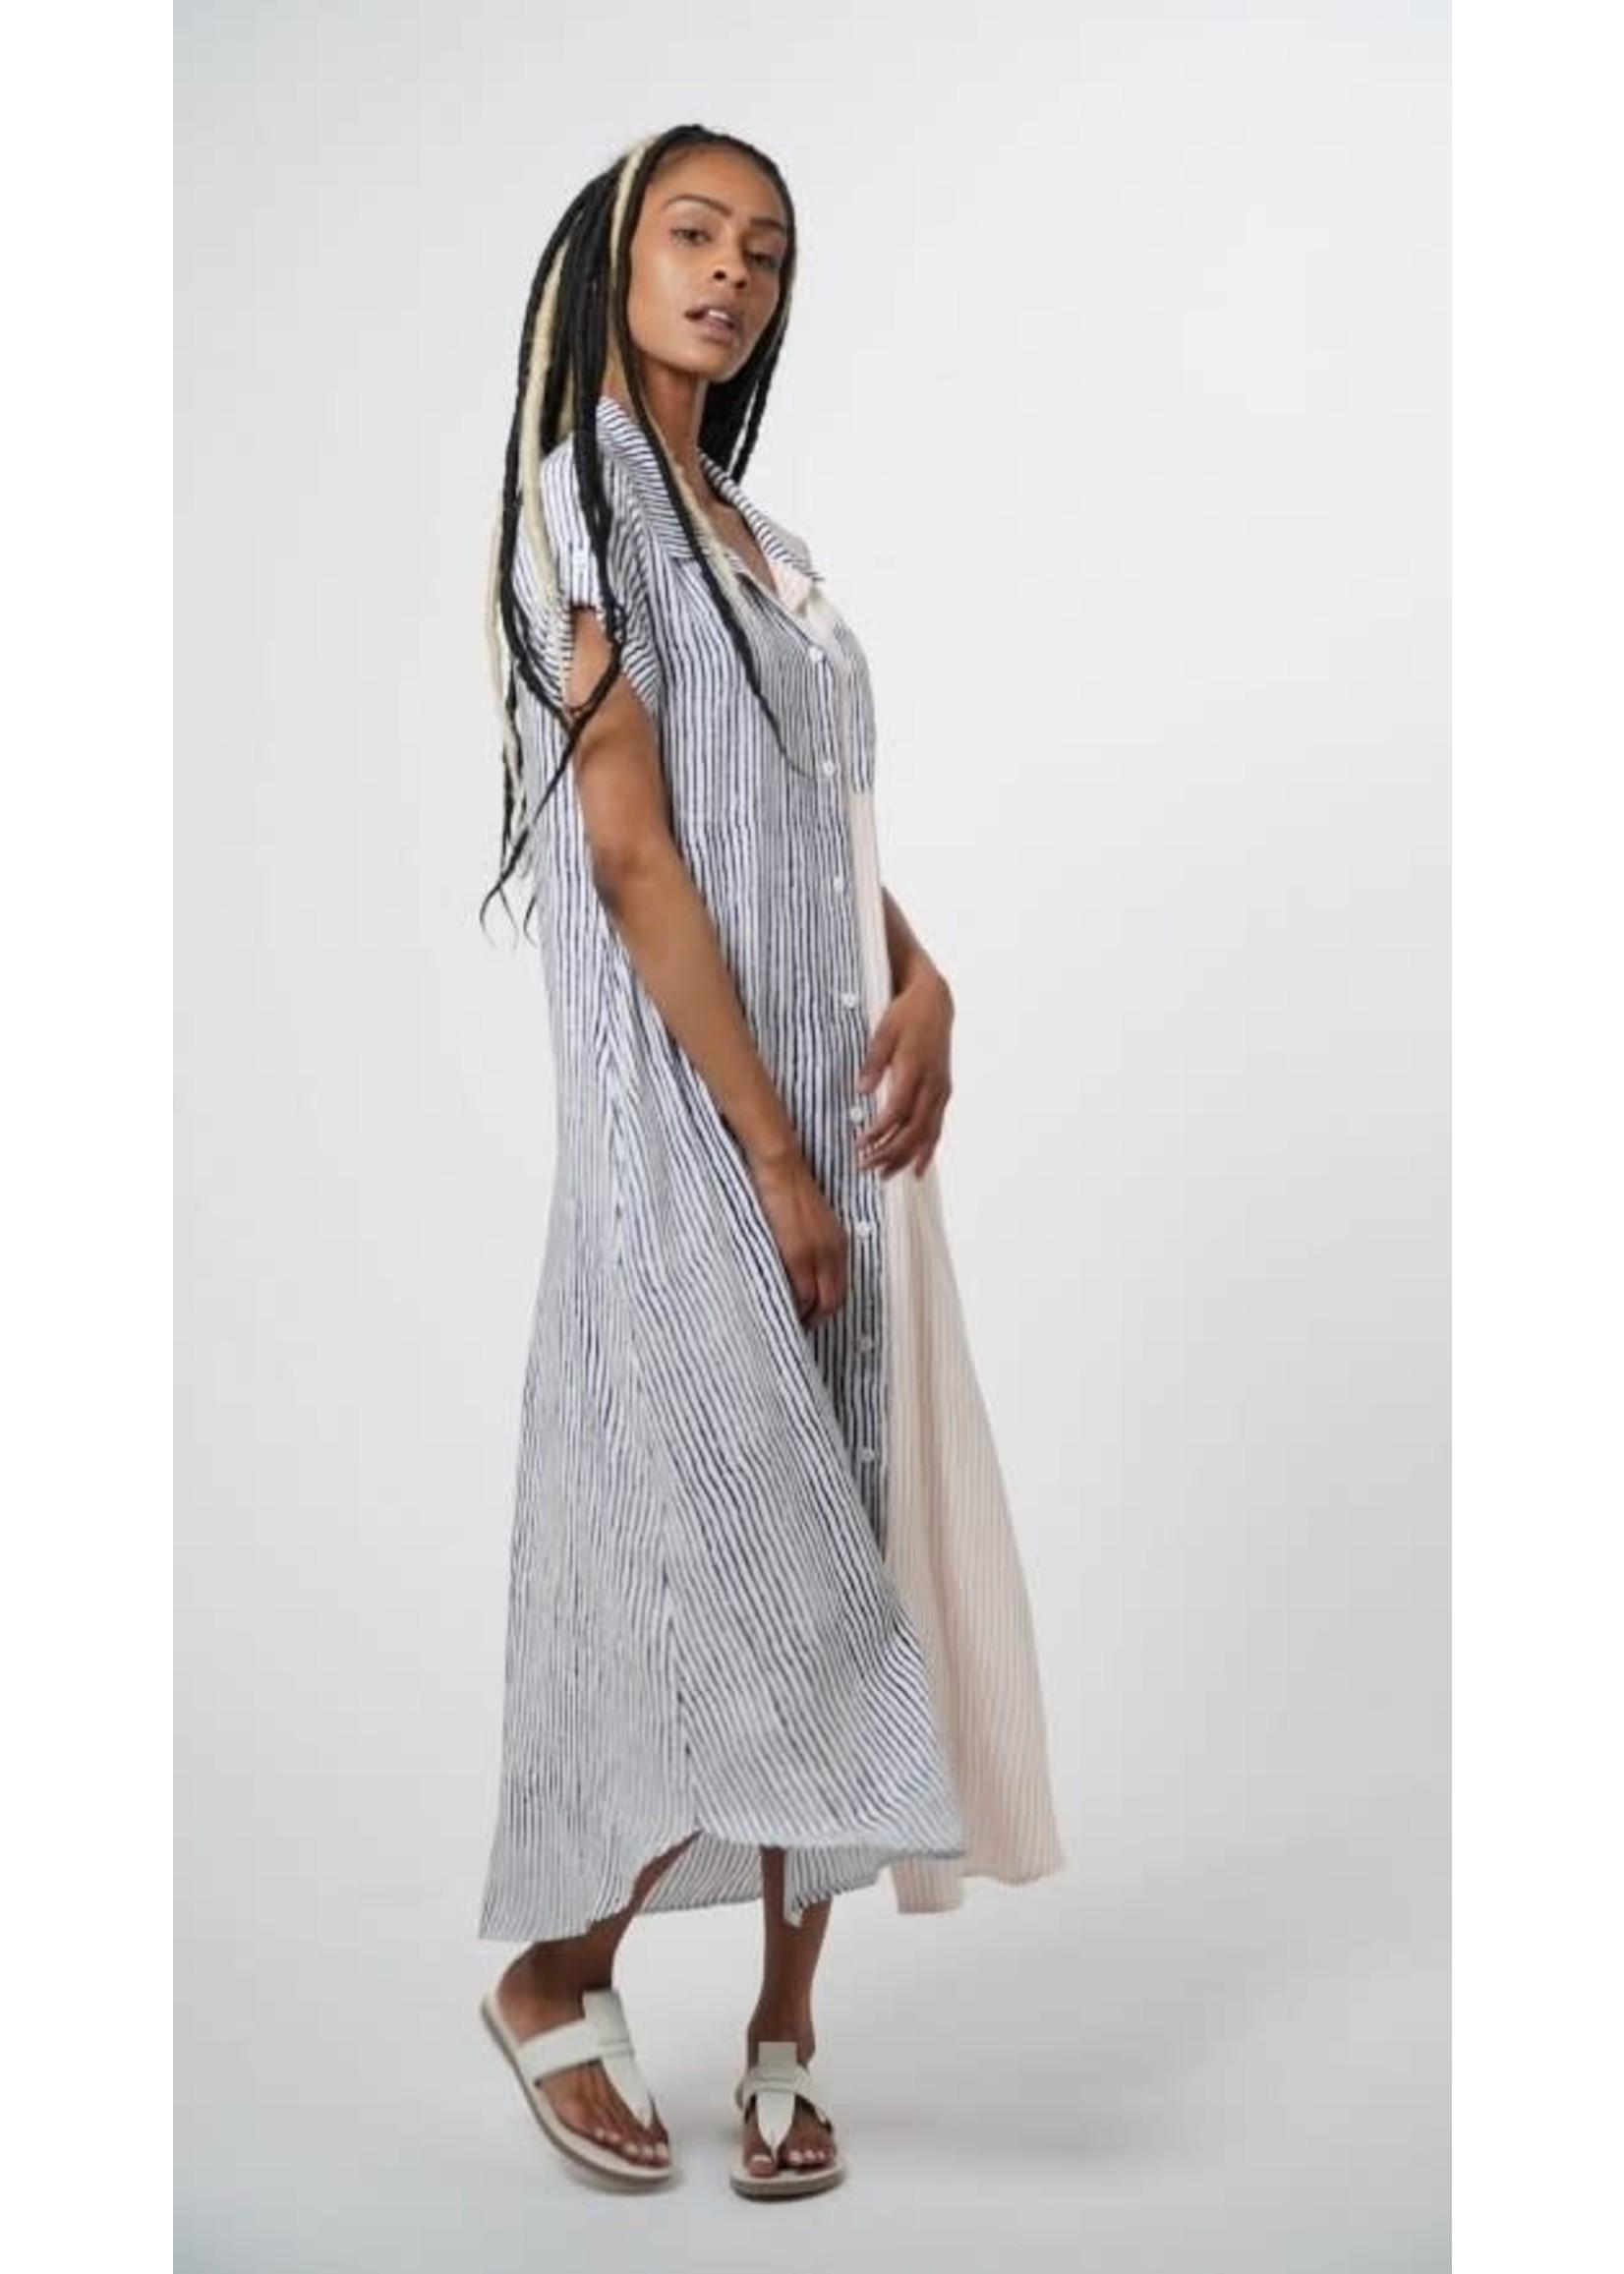 LUUKAA 20y512 luukaa dress